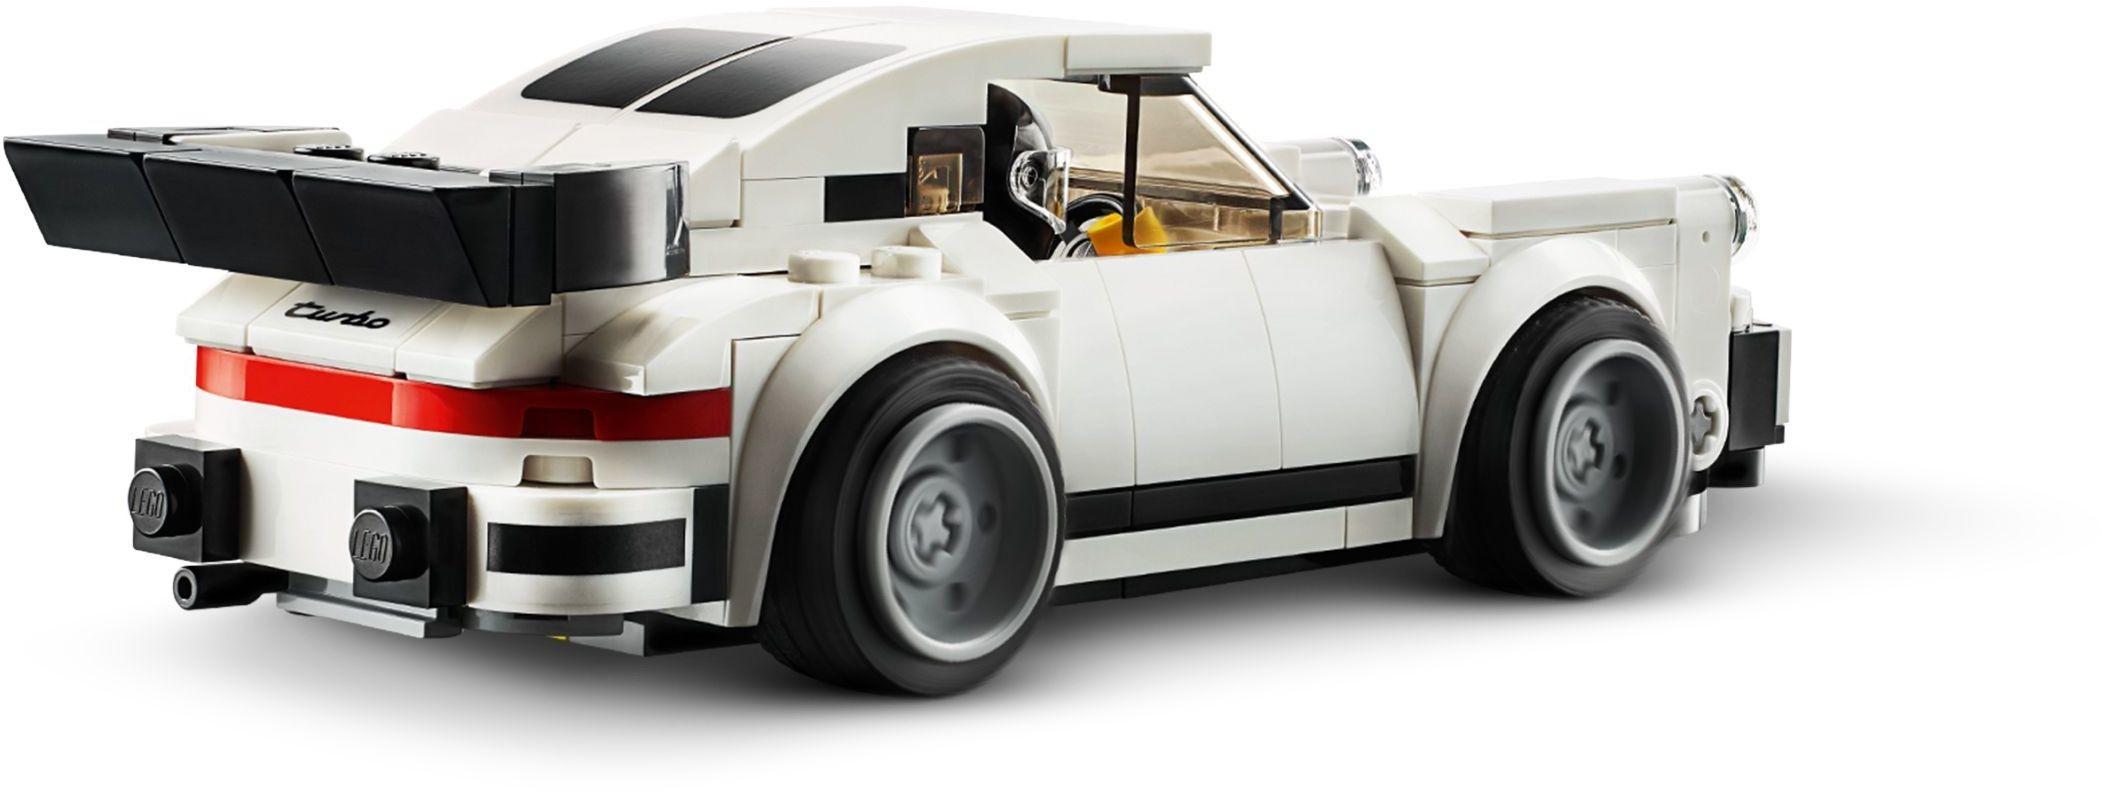 WANGE S72 Super Racing Cars: Porsche 911 RSR and Porsche 911 Turbo 3.0 9